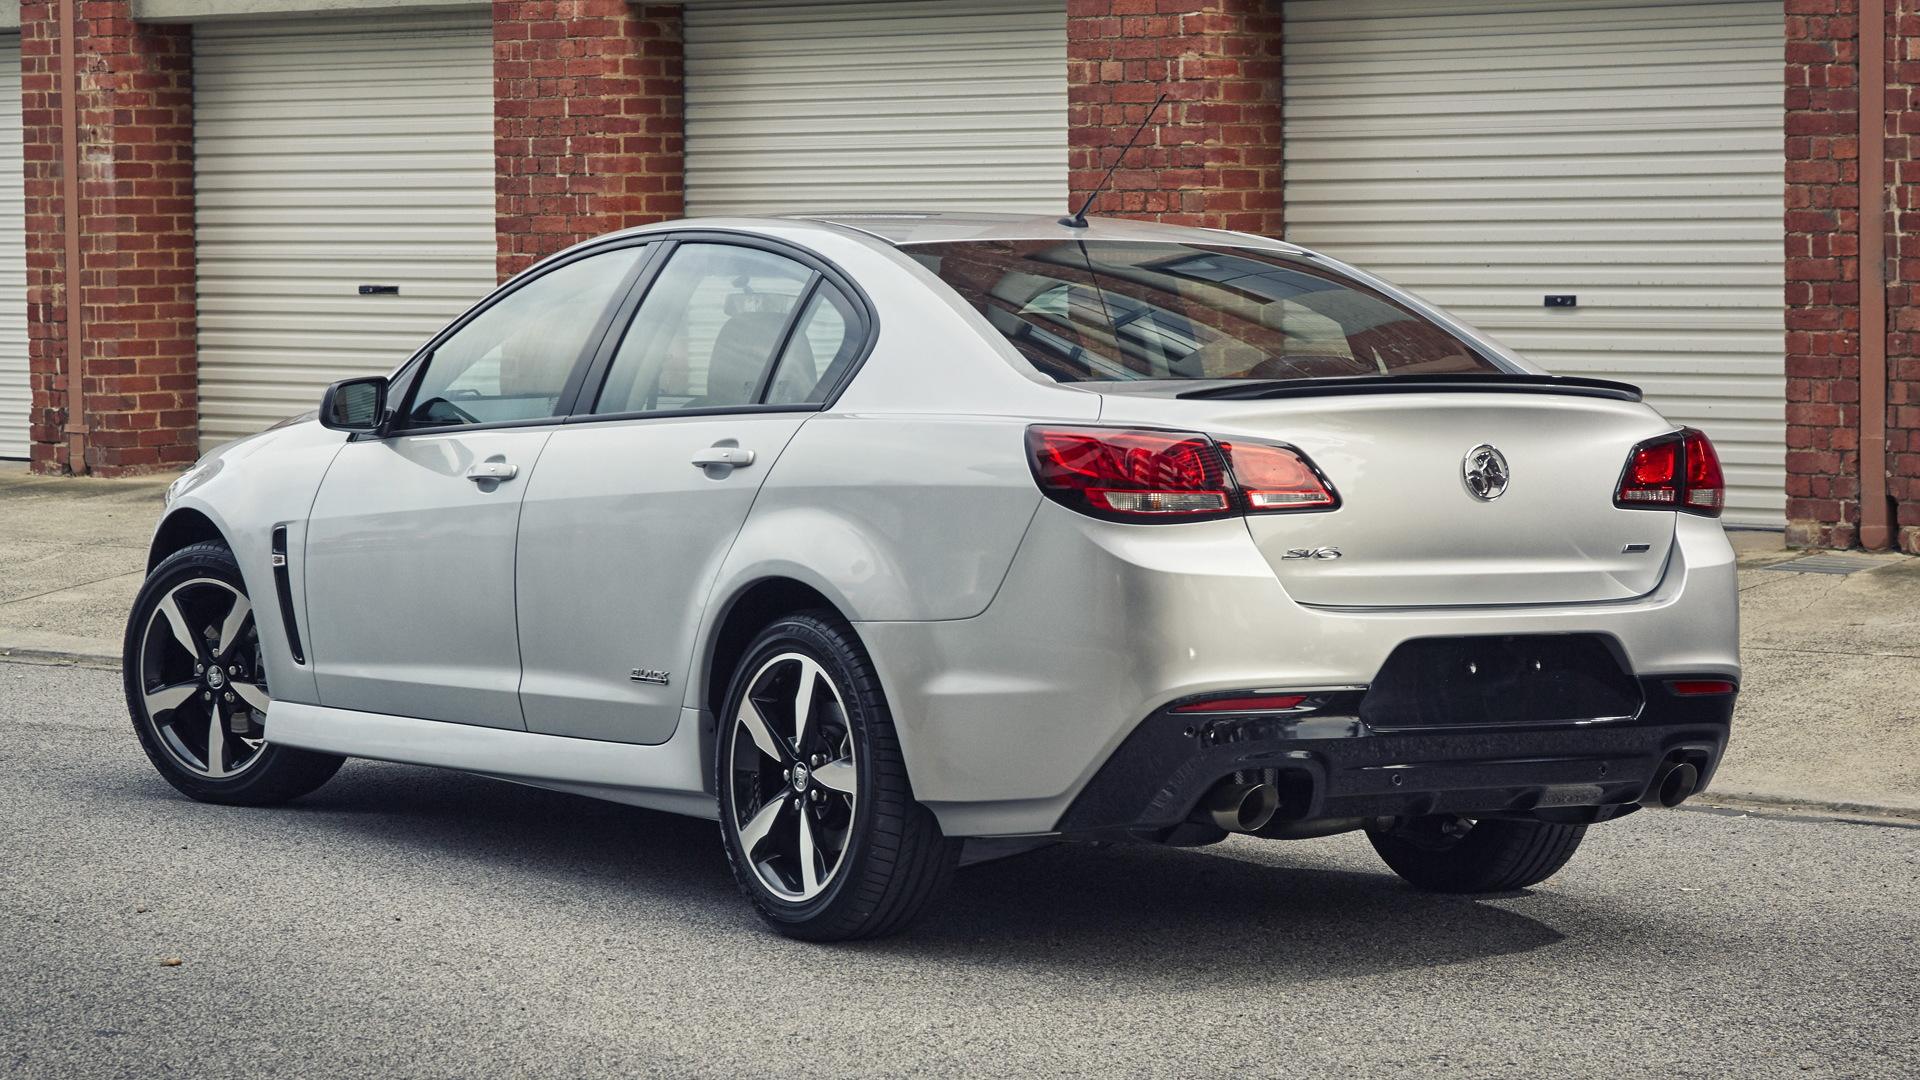 2016 Holden Commodore SV6 Black Edition